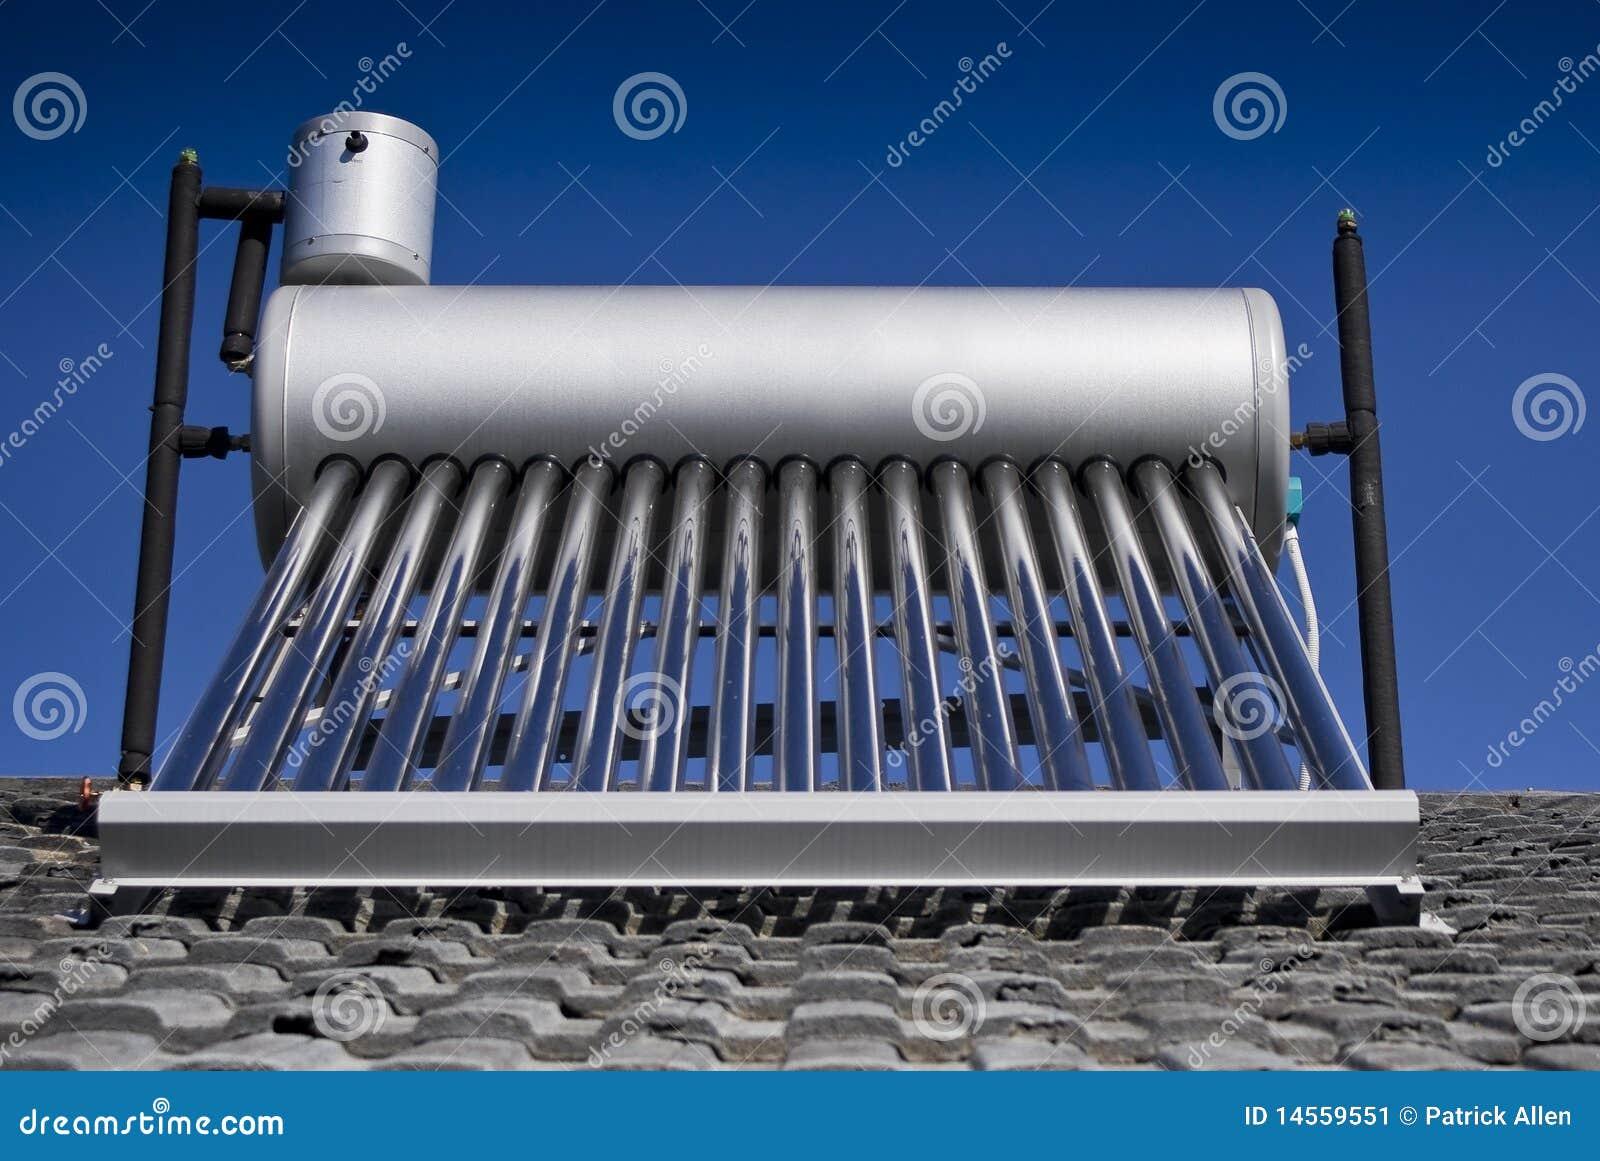 Calentador de agua solar tubos de cristal evacuados - Calentador de agua precios ...